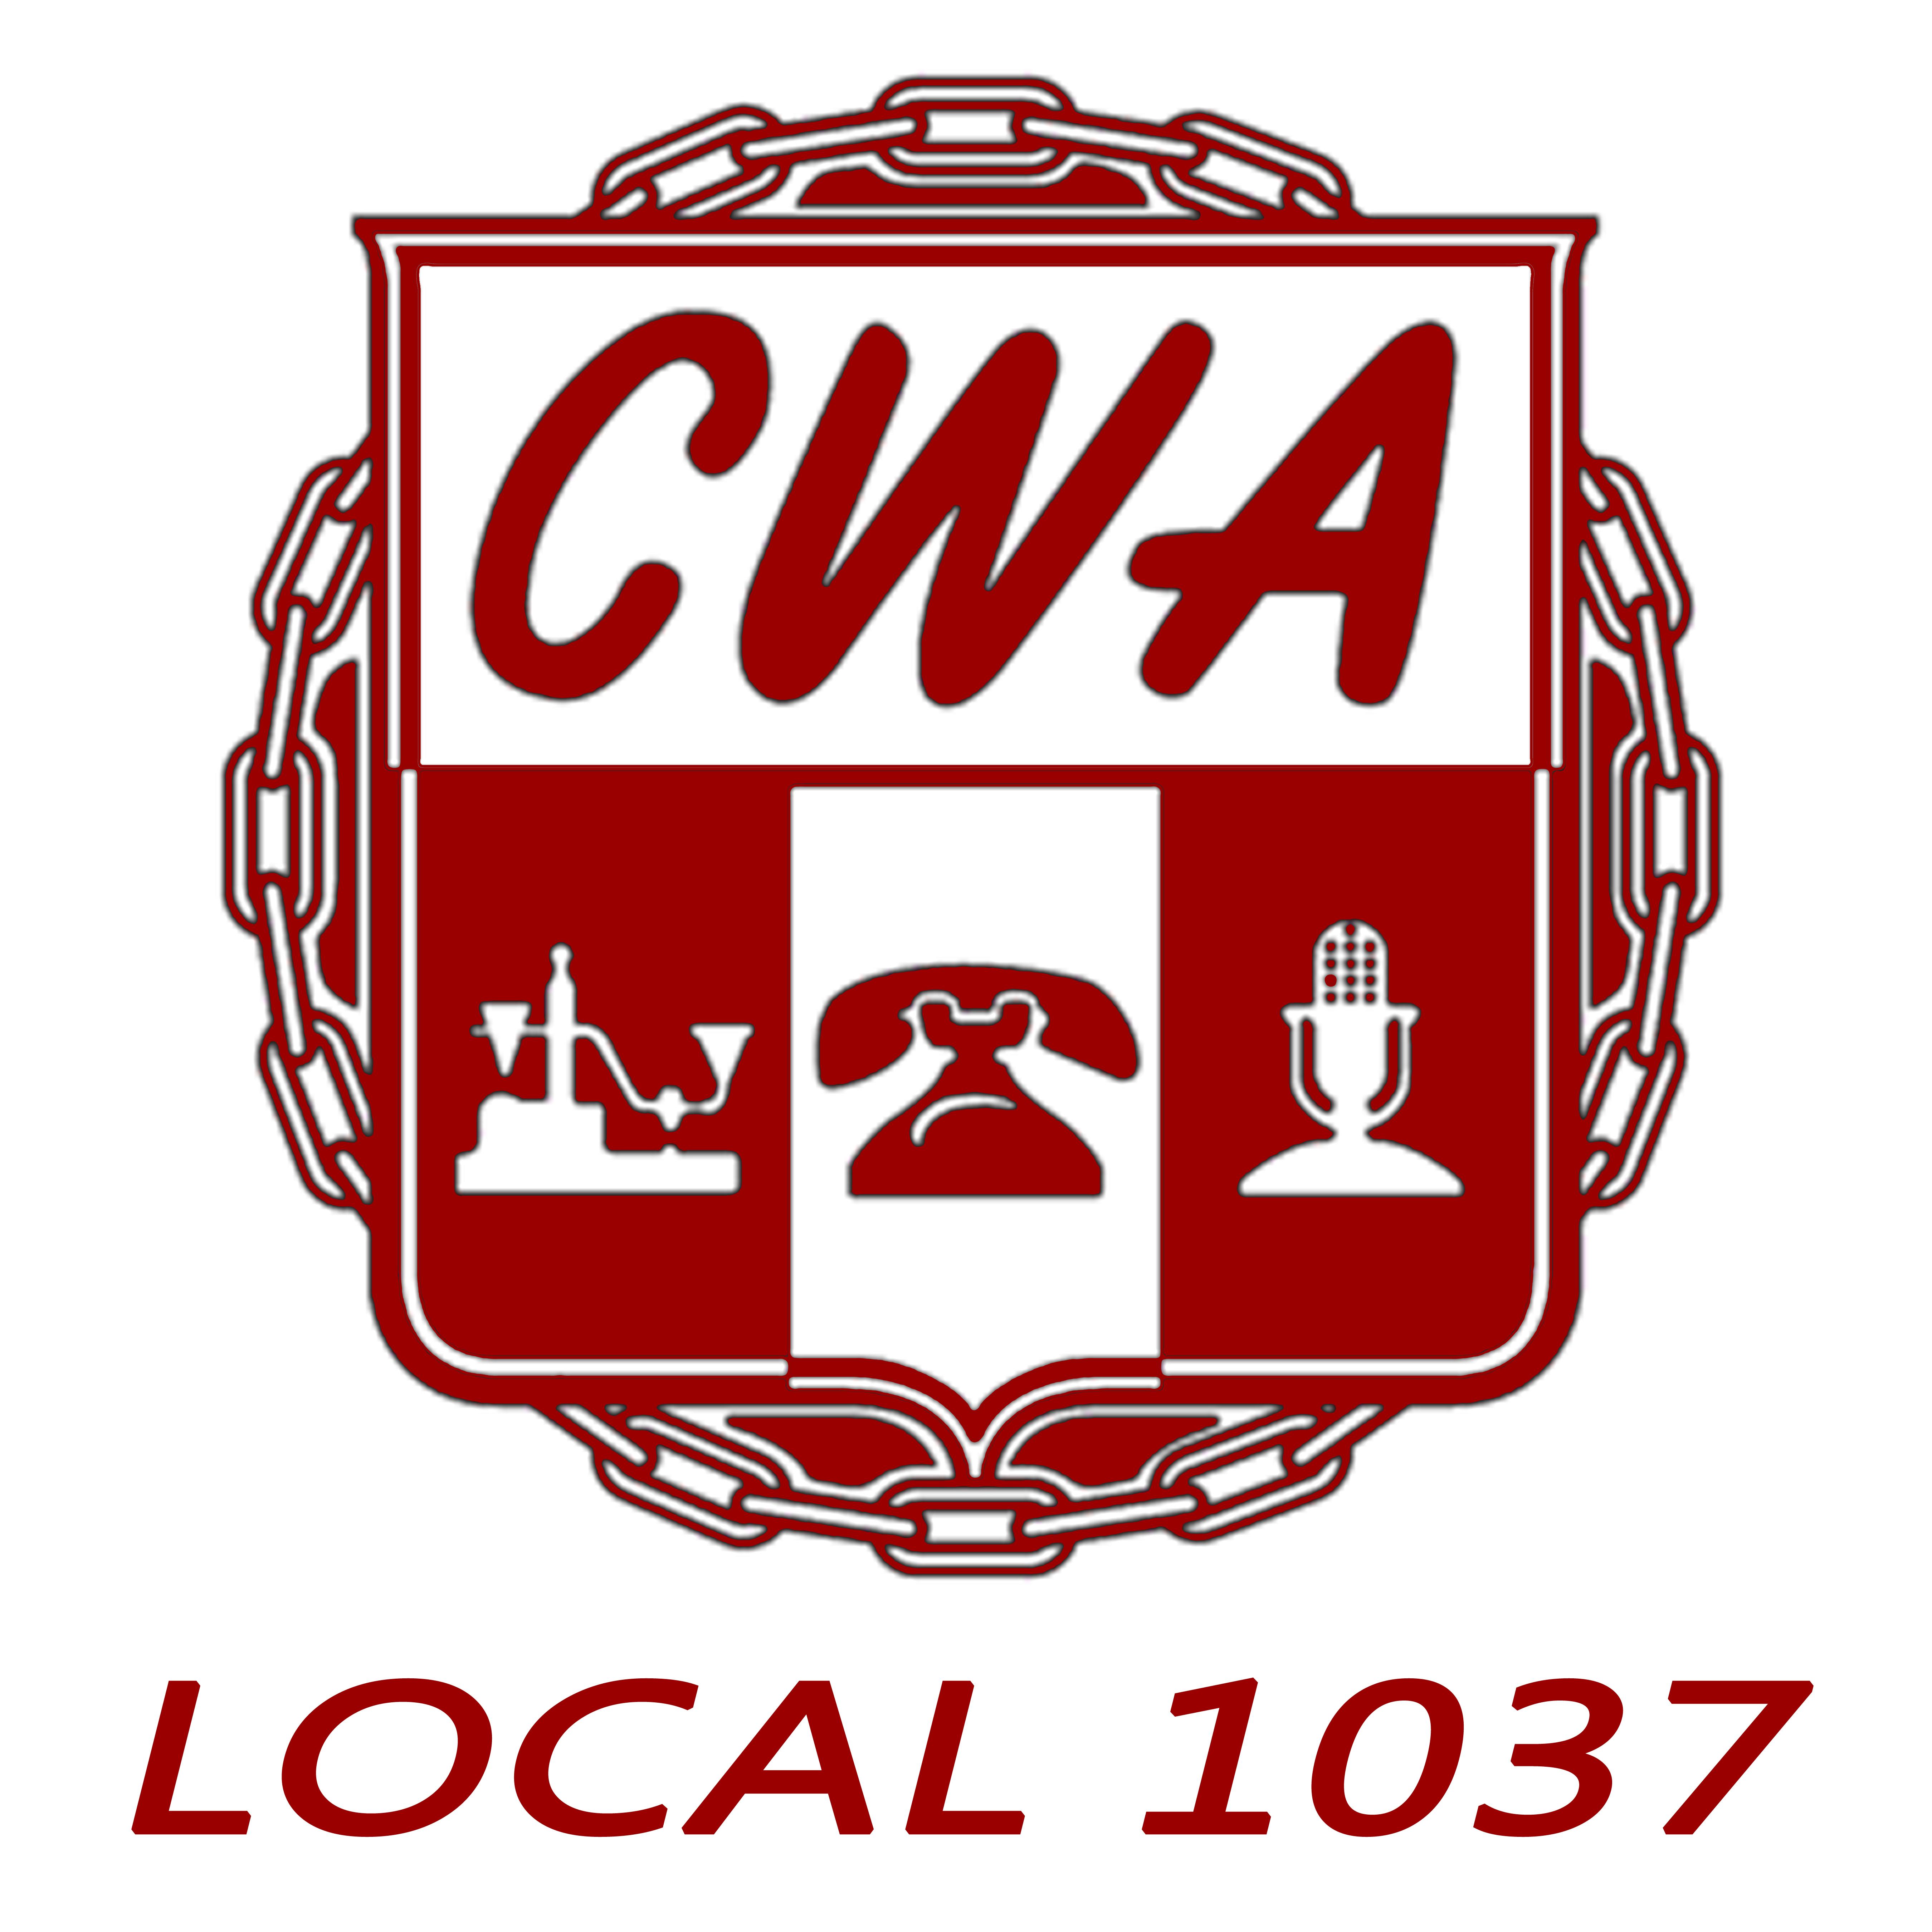 CWA-Local-1037.jpg